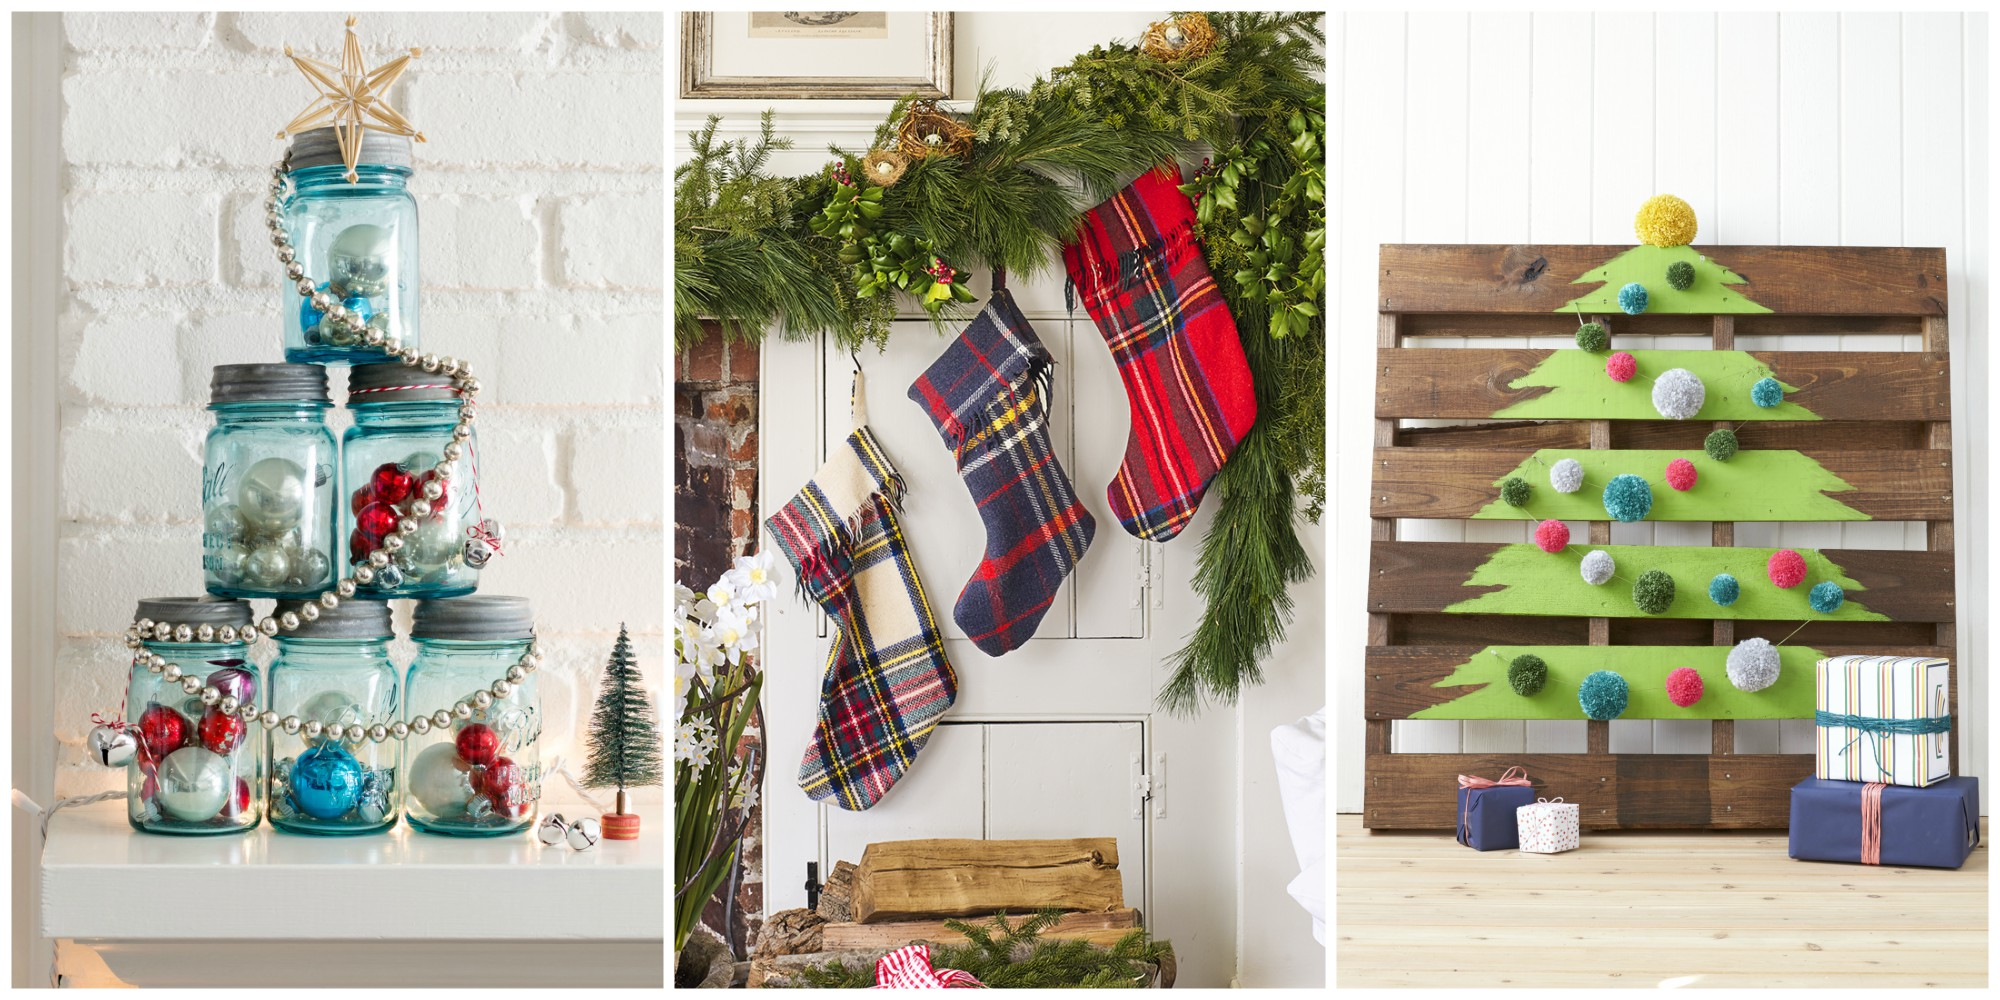 37 DIY Homemade Christmas Decorations